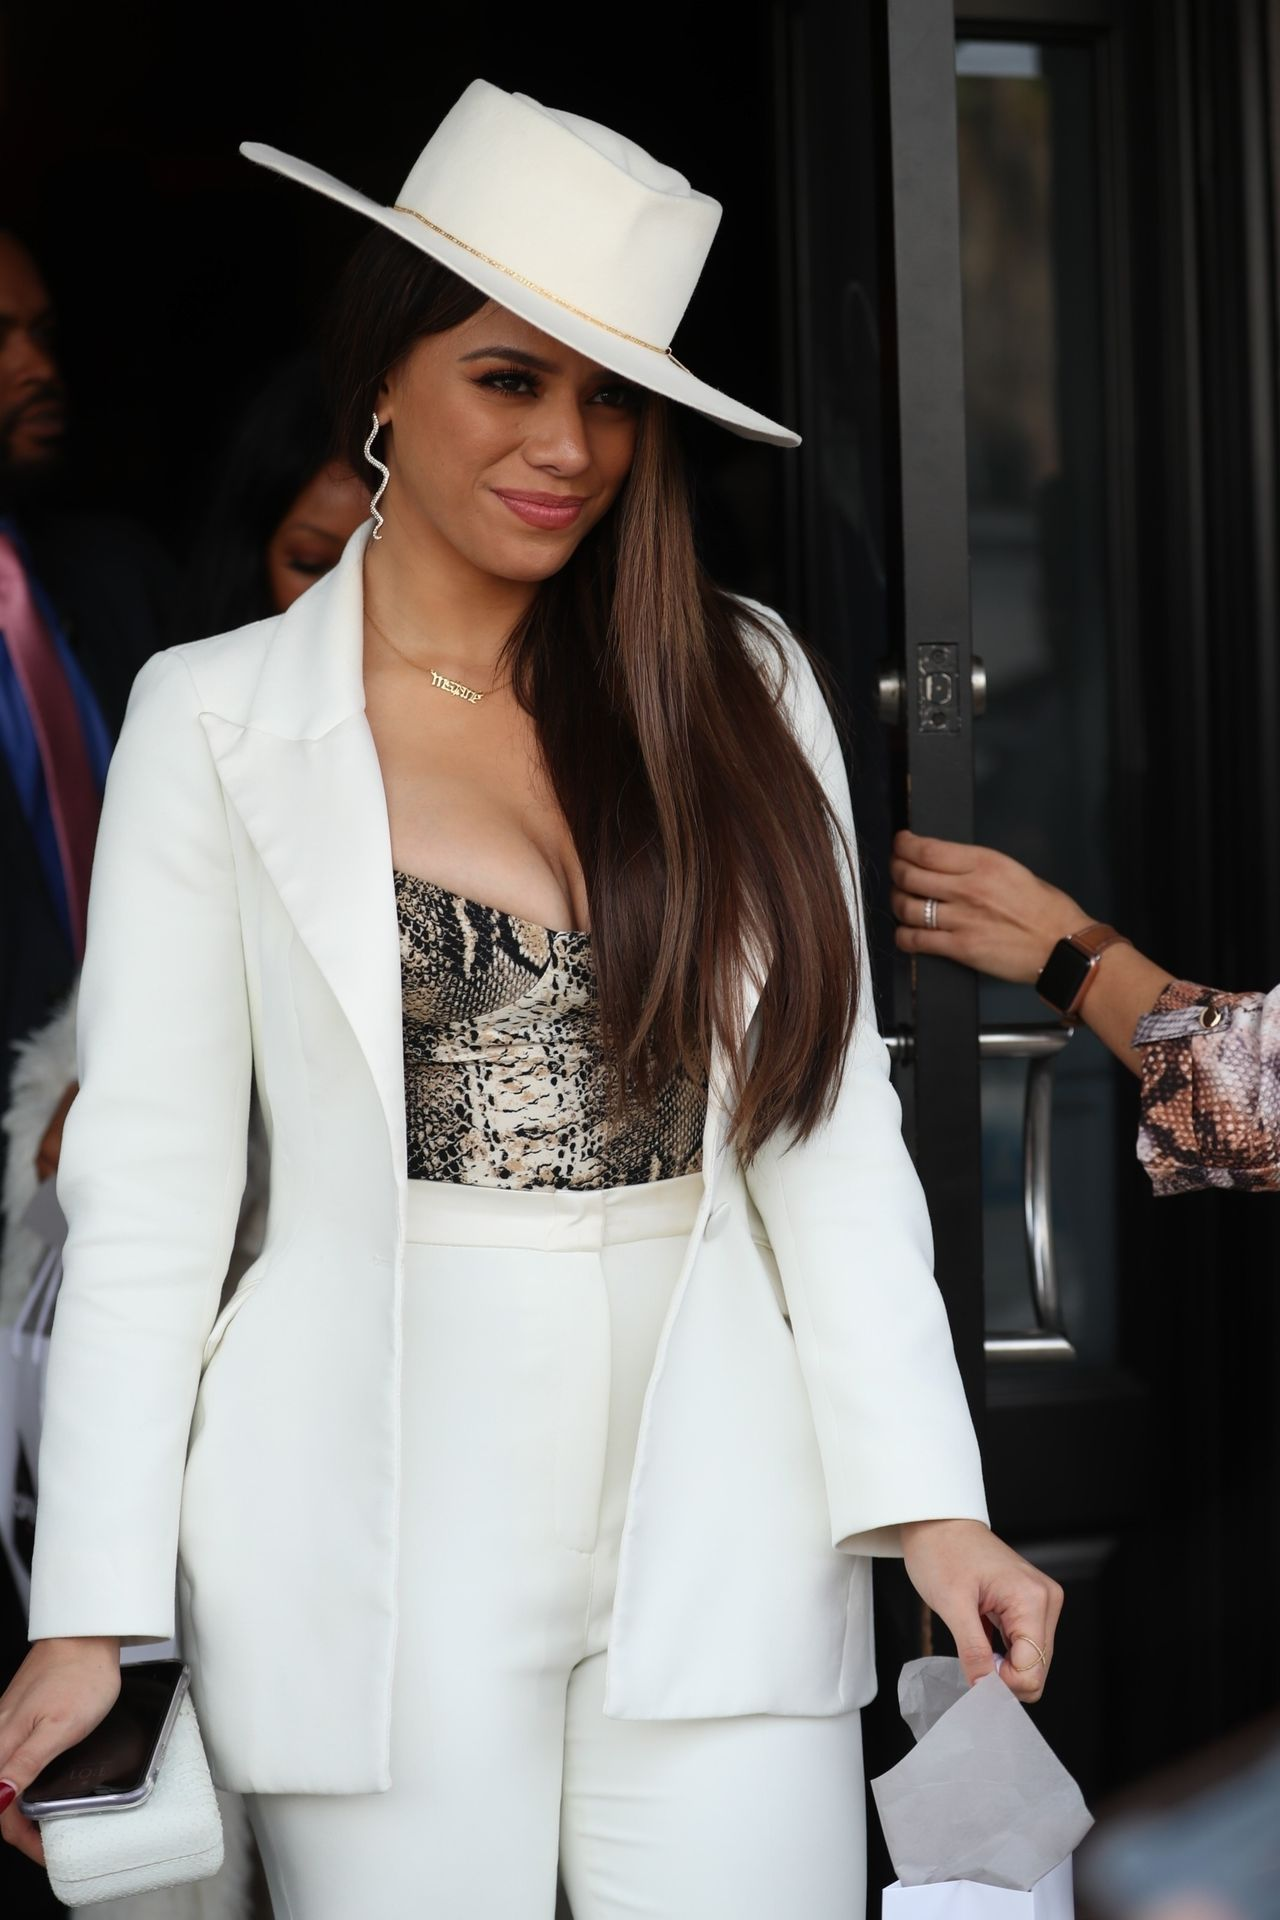 Dinah Jane Departs The Women In Harmony Pre Grammy Luncheon 0027